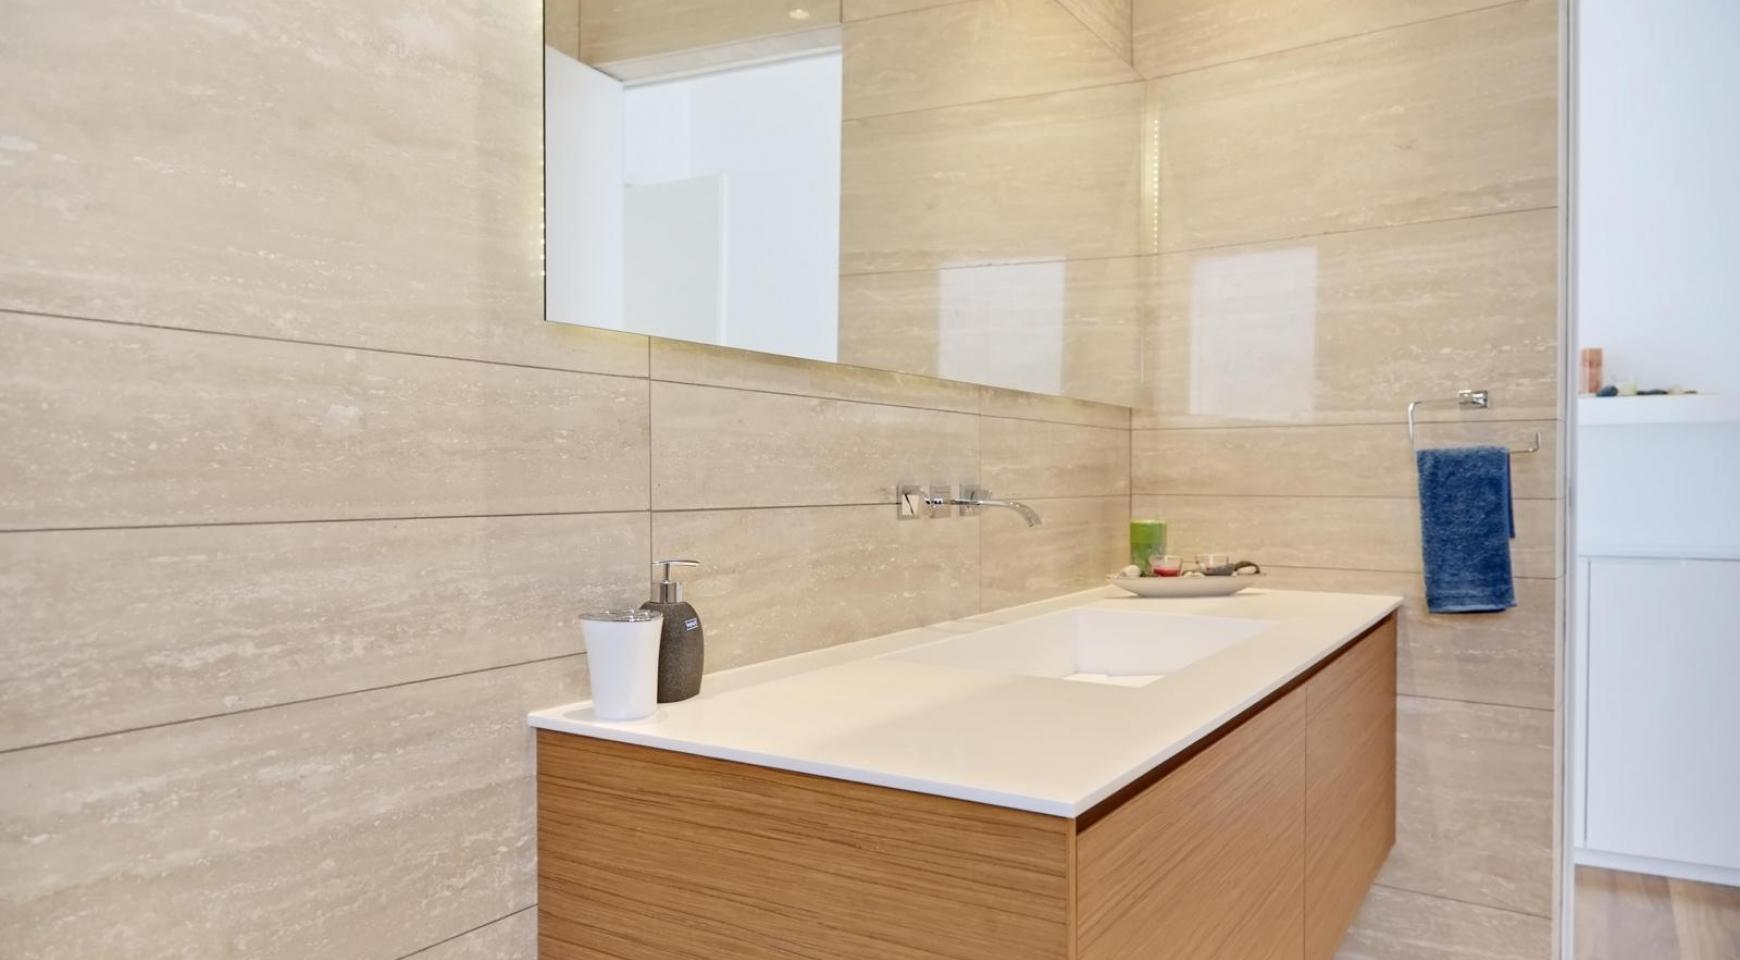 New Luxurious 4 Bedroom Villa in the Tourist Area - 46